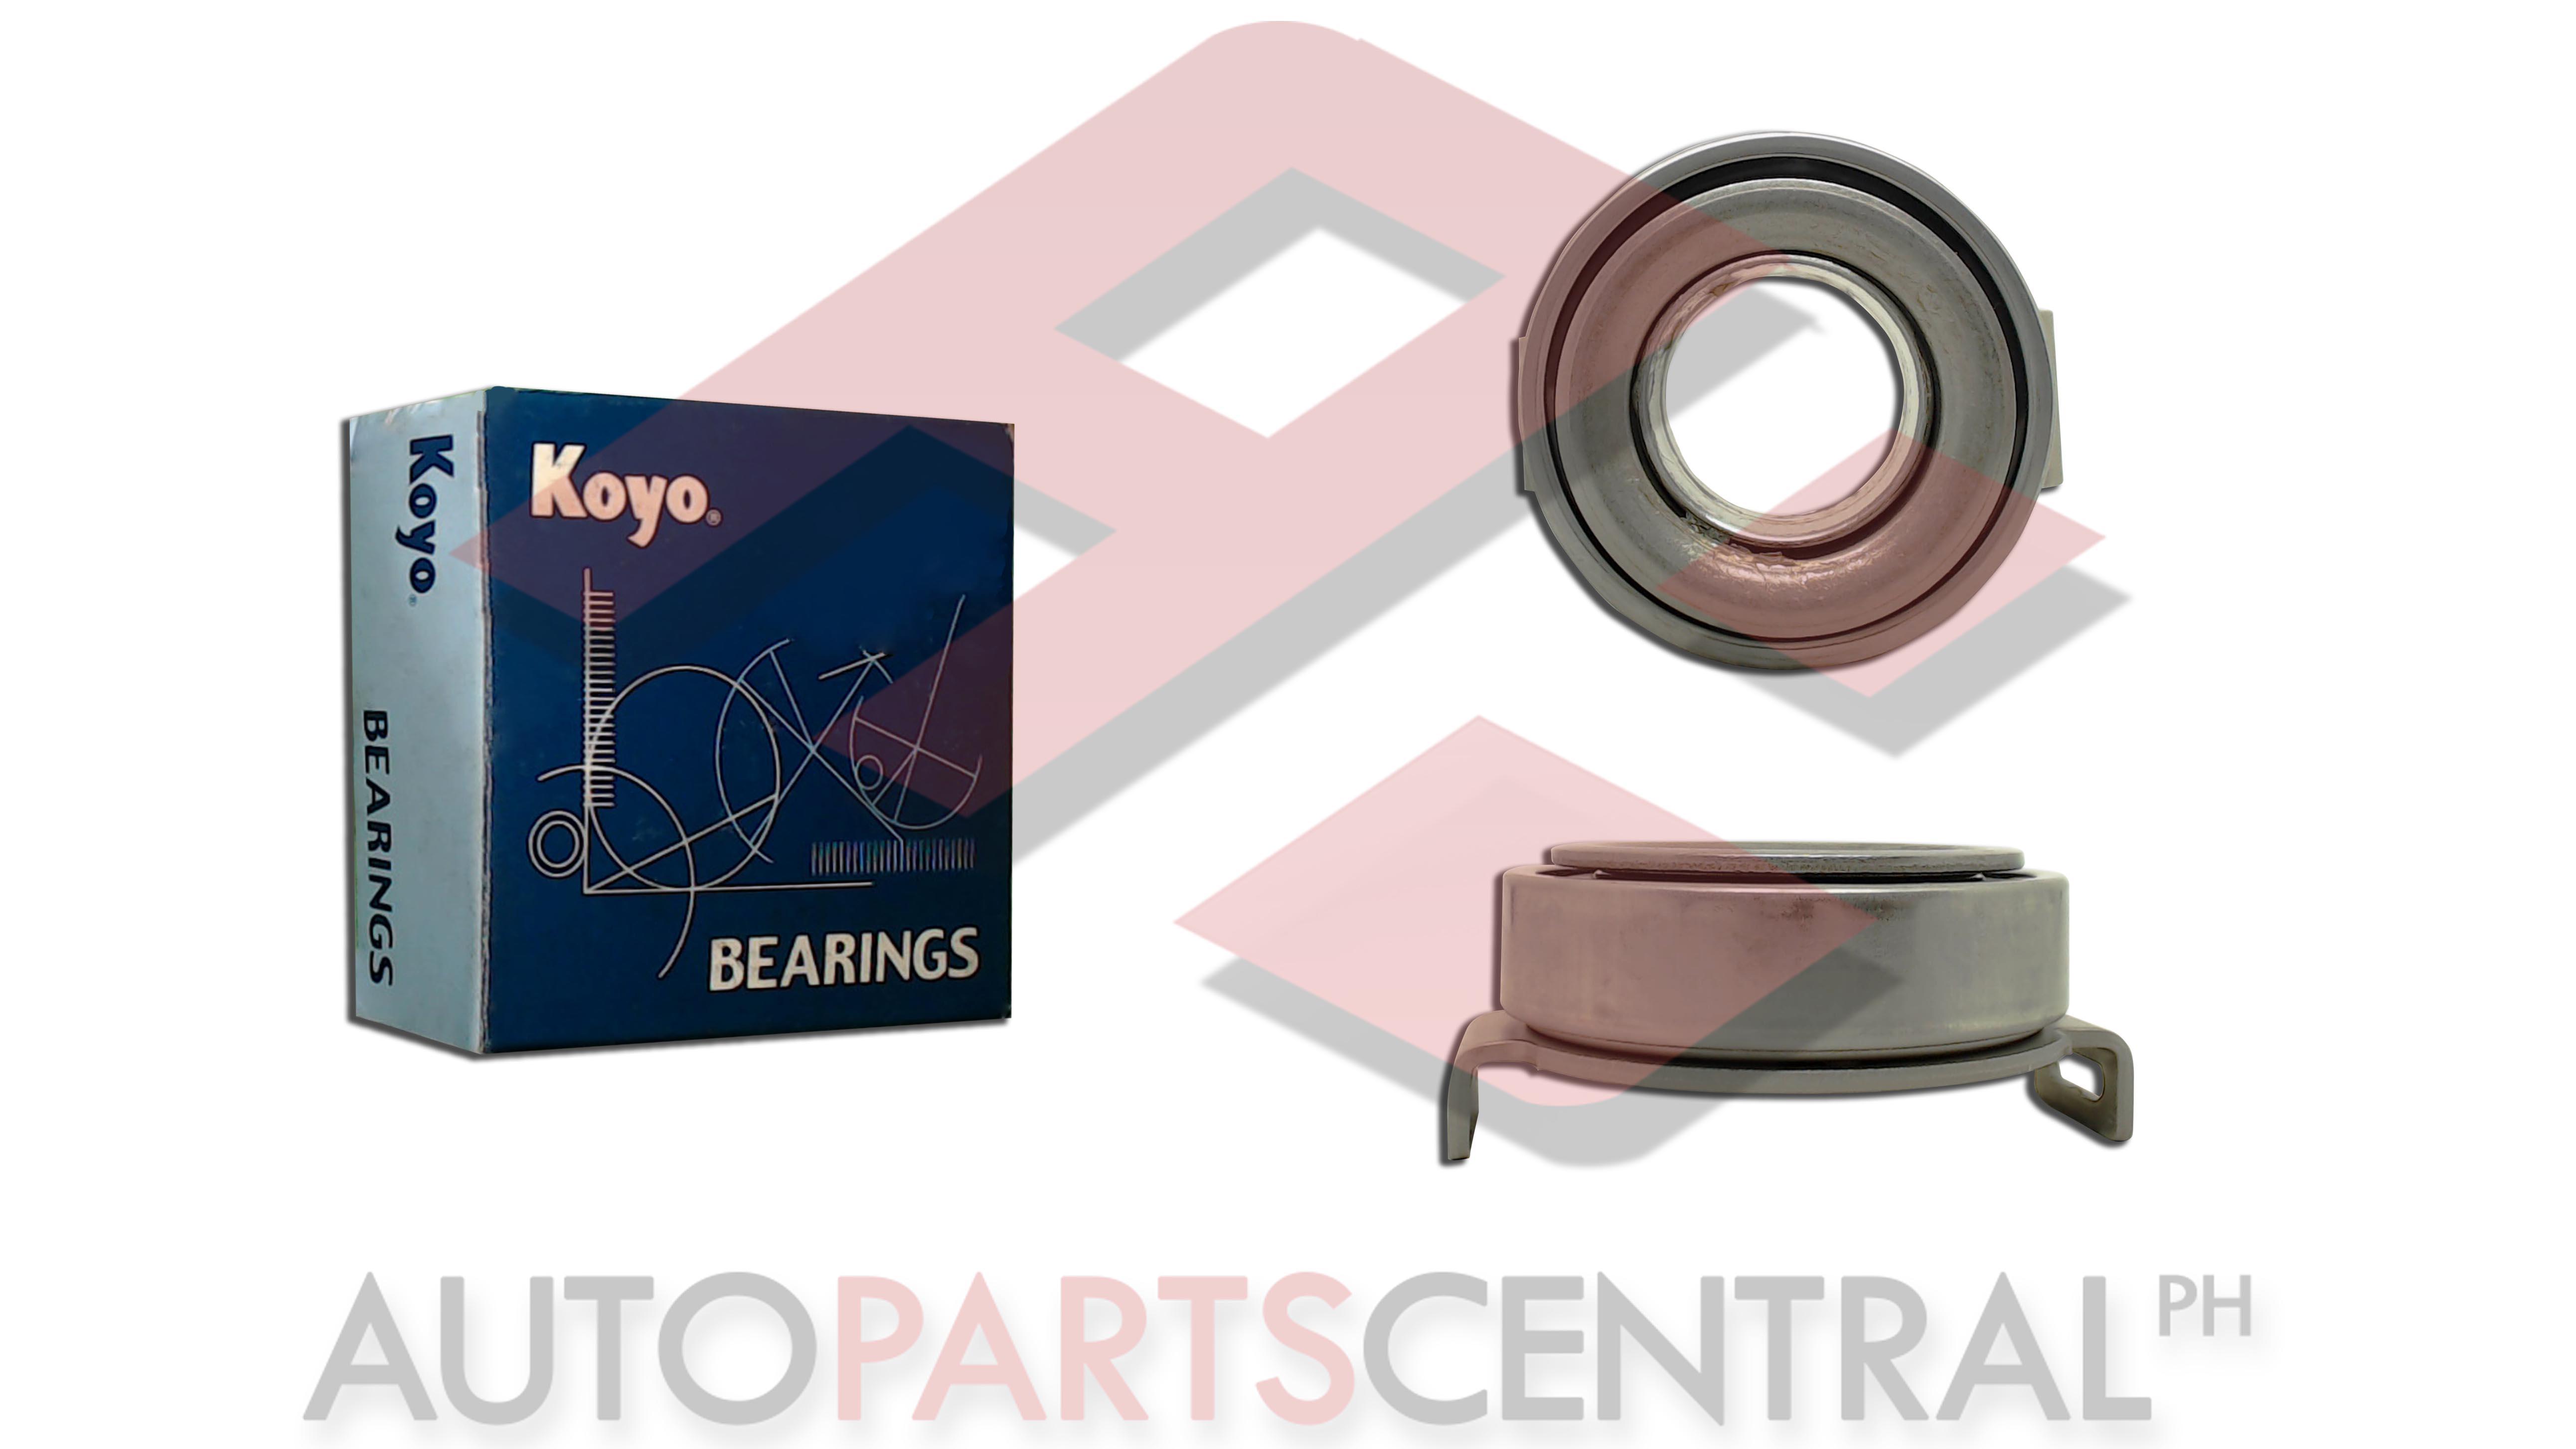 Bearing Koyo RCTS338S Release Bearing SUZUKI Multicab